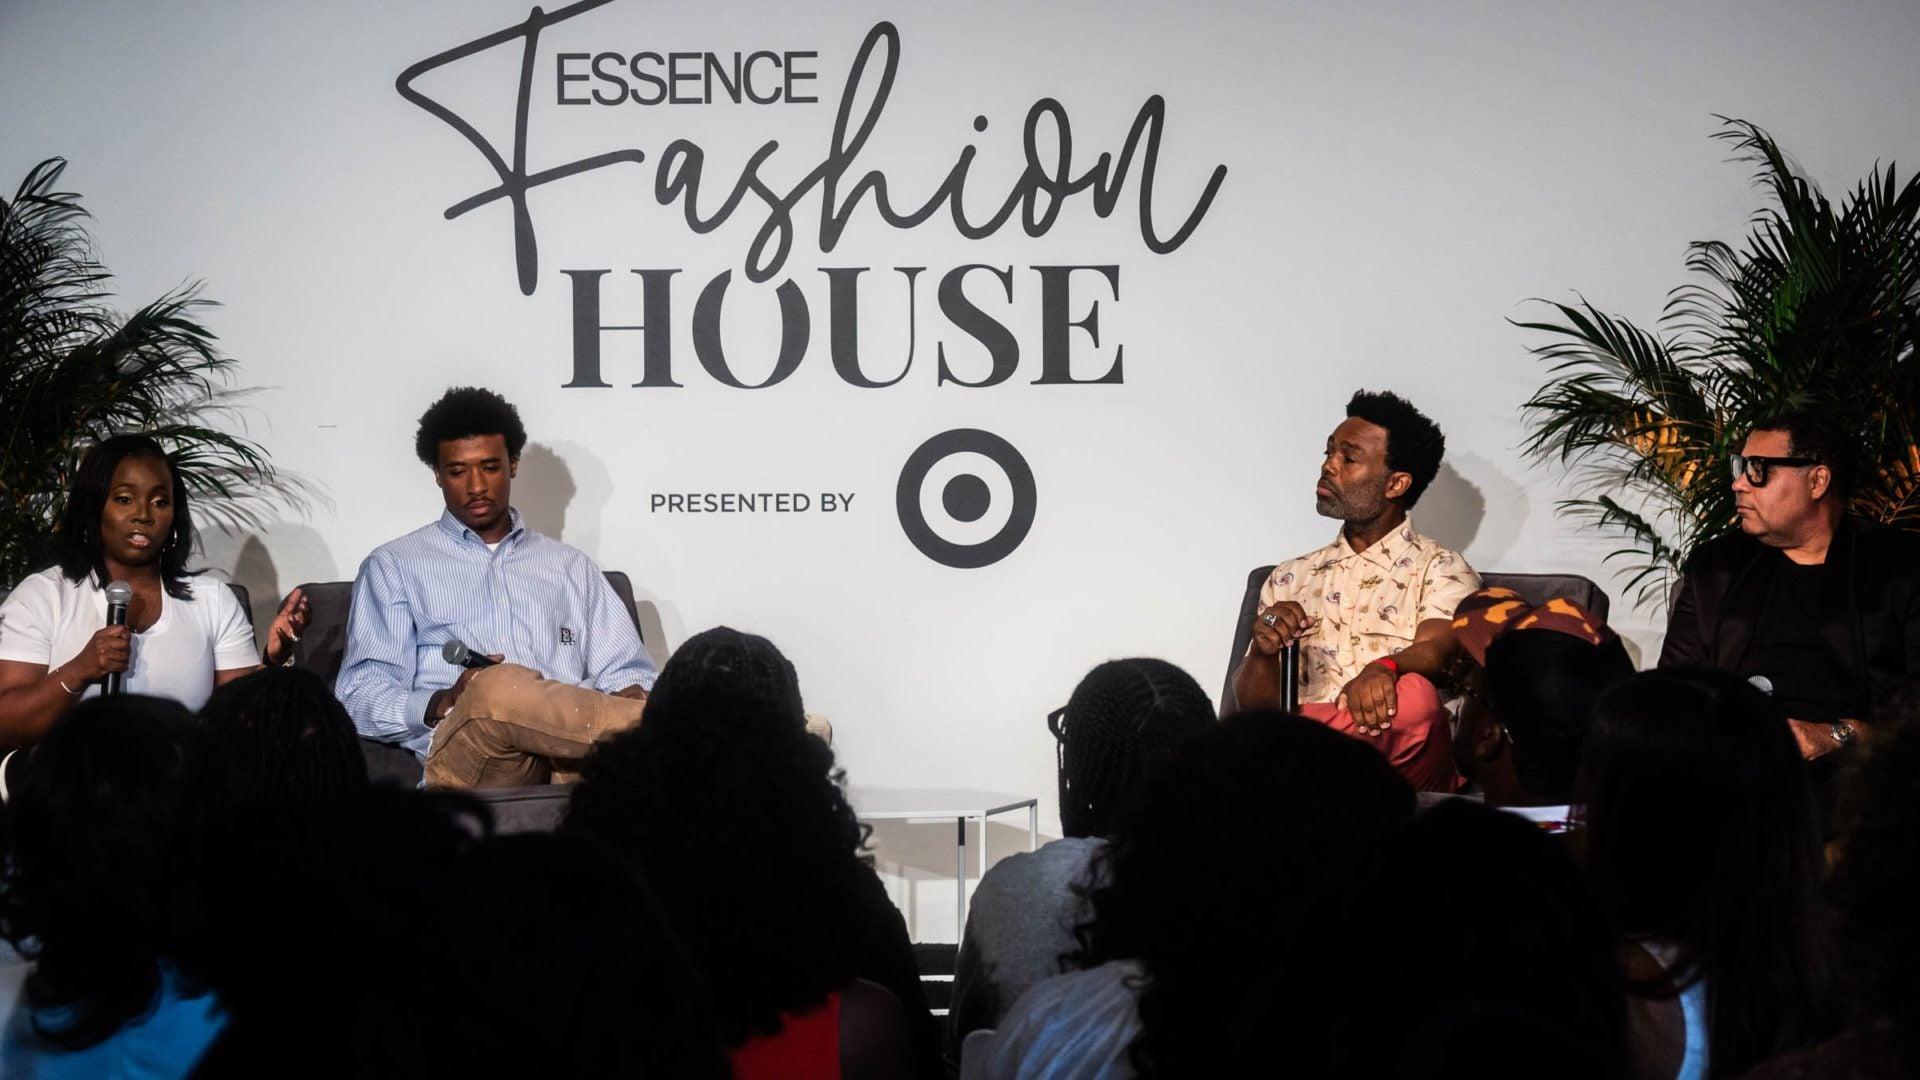 ESSENCE Fashion House NYC: Ouigi Theodore, Guy Wood Sr., Leroy Pope, And Sharifa Murdock Talk Running A Successful Business